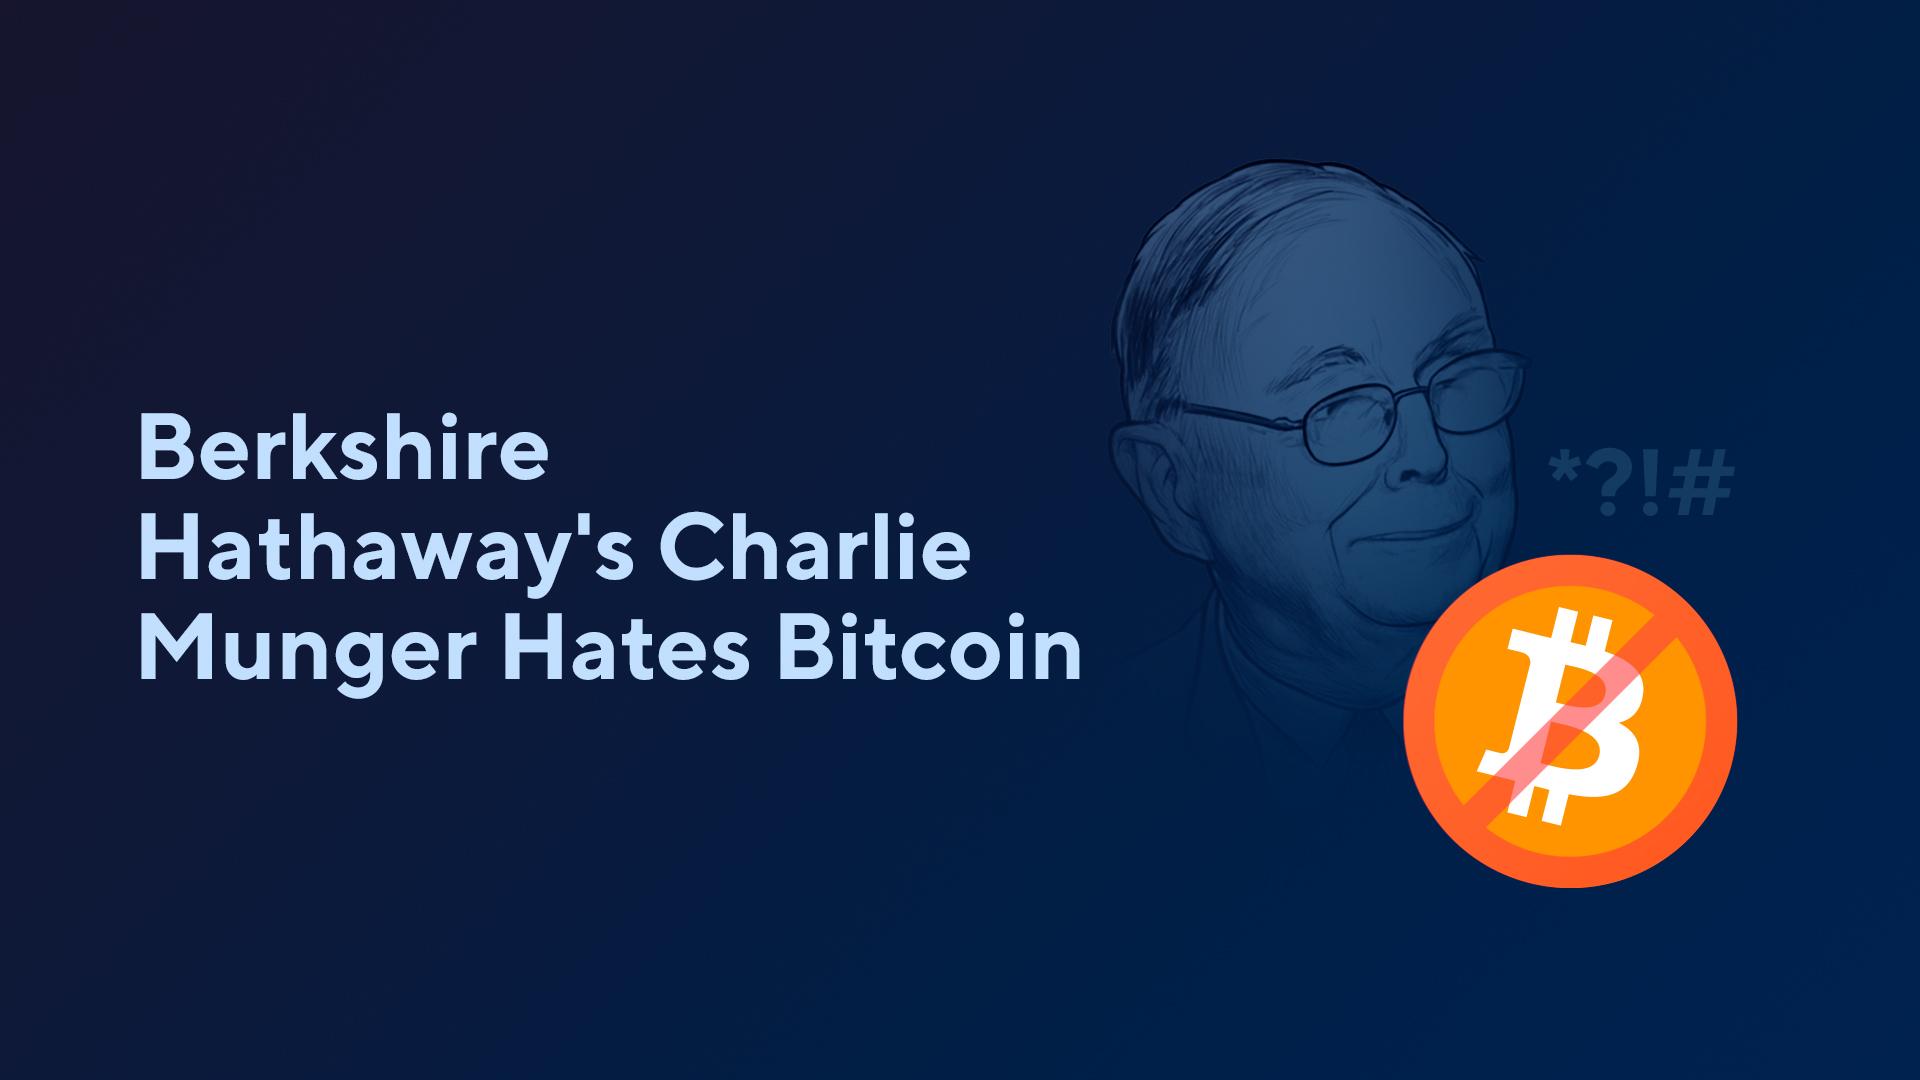 Berkshire Hathaway's Charlie Munger Hates Bitcoin